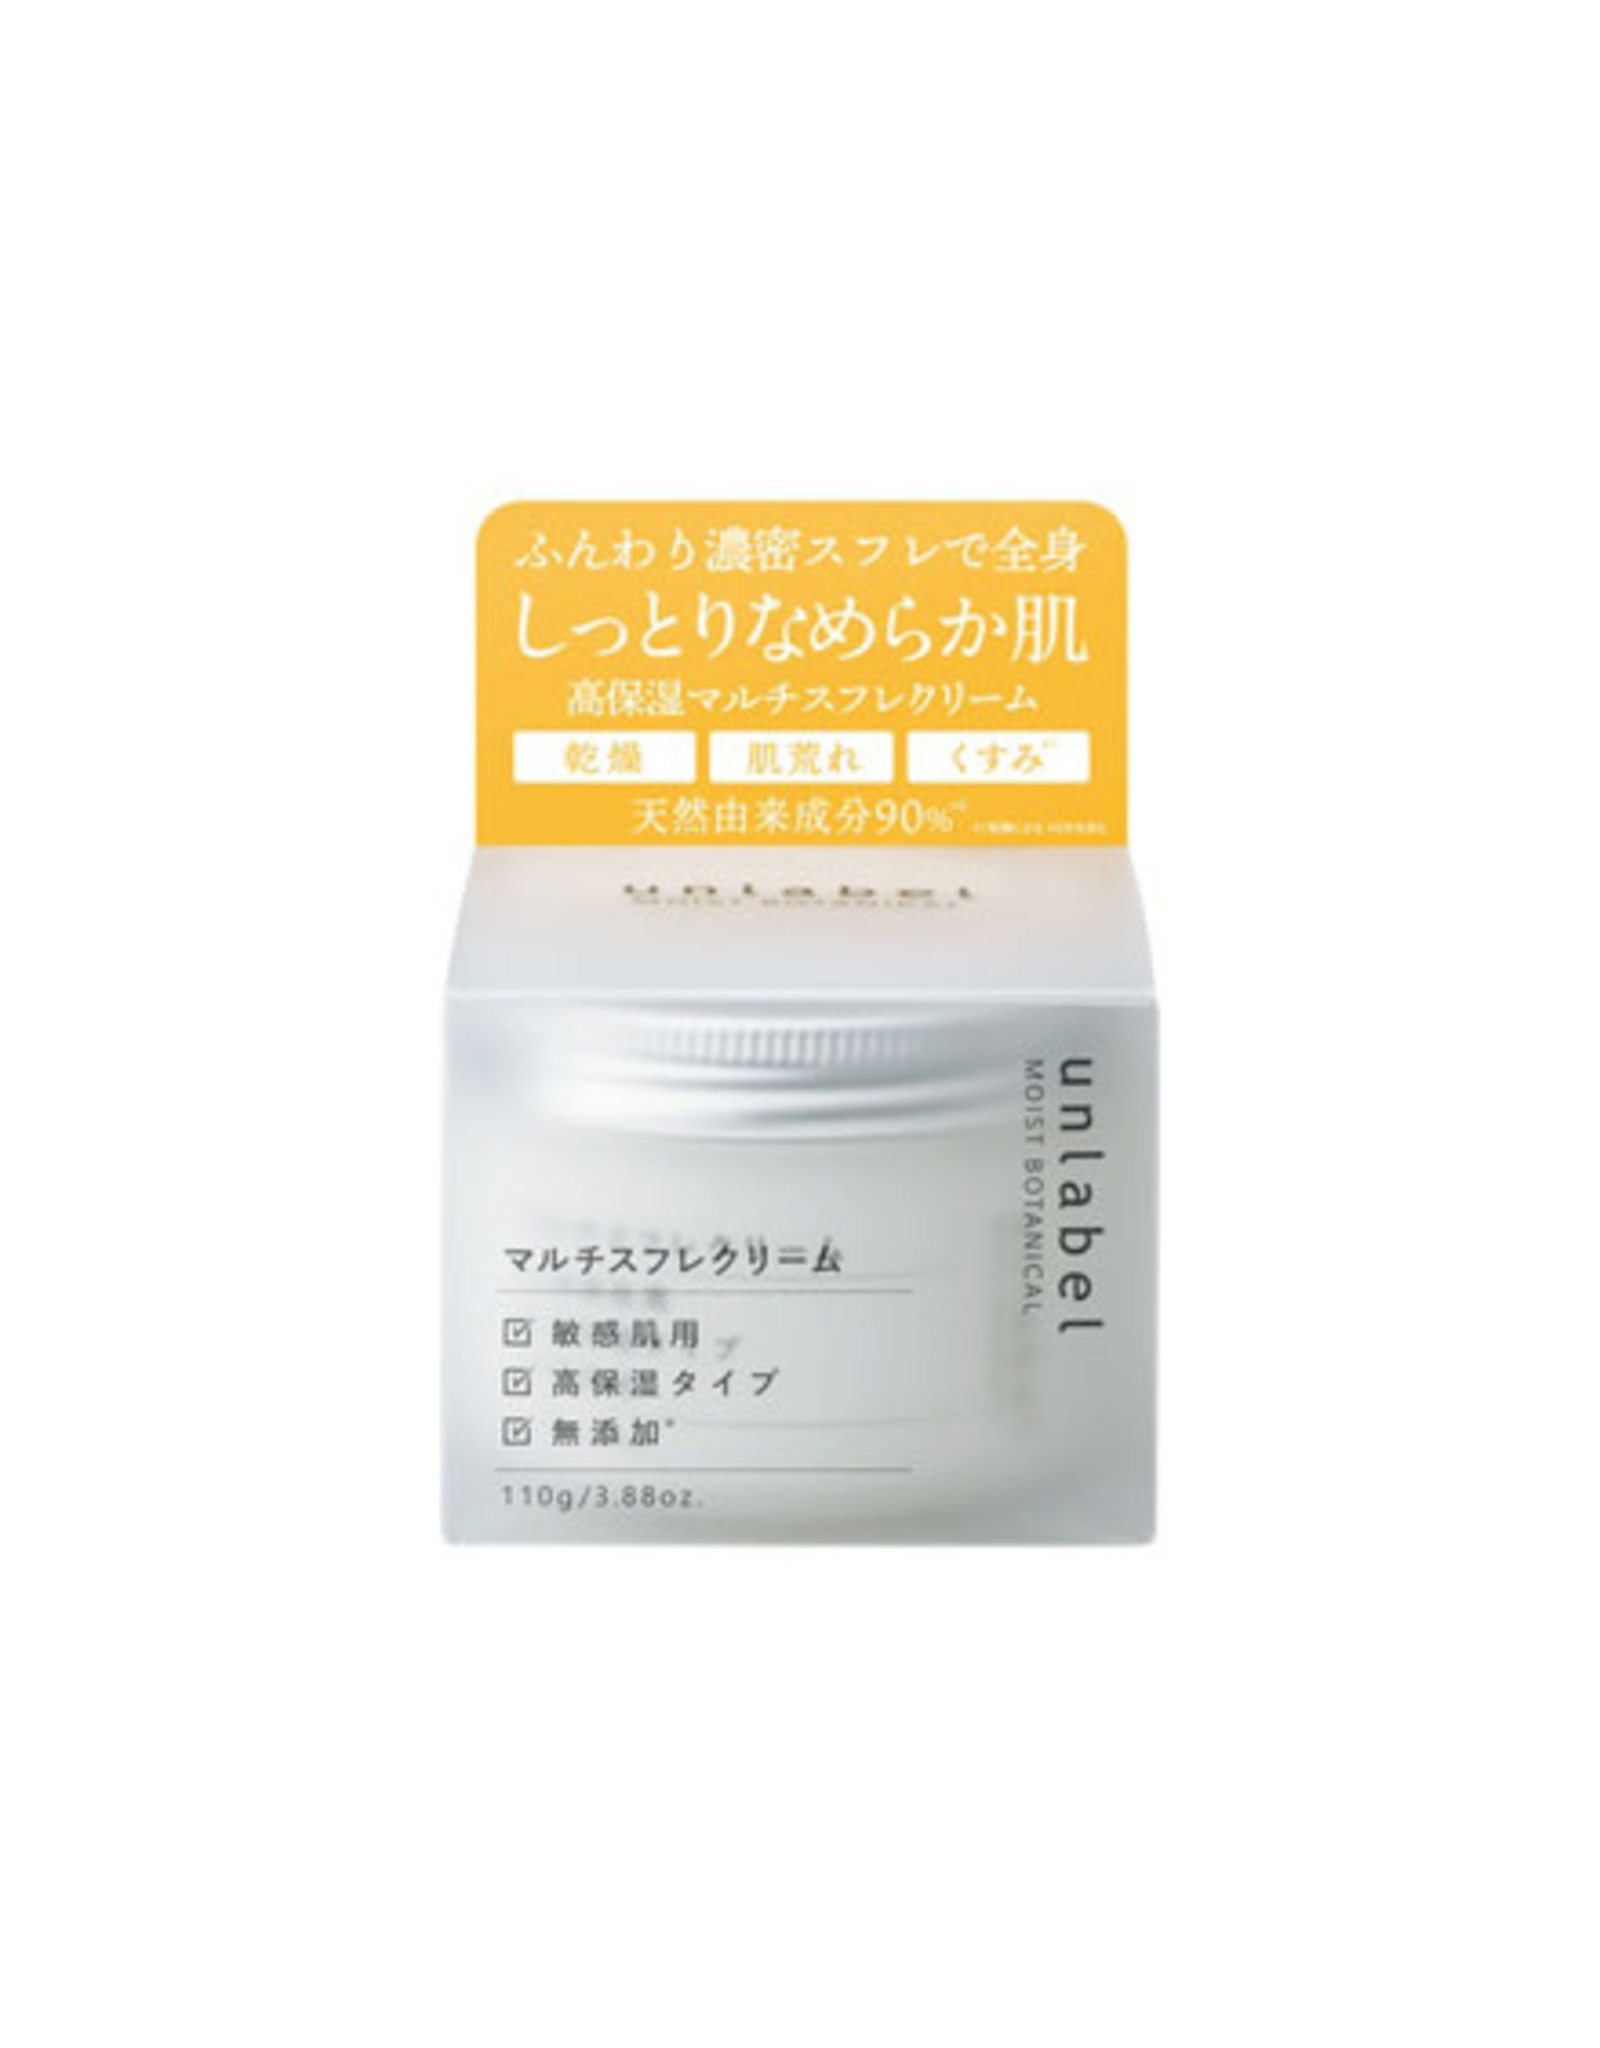 JPS Labo Co. Unlabeled Moist Botanical Multi Soufflé Cream